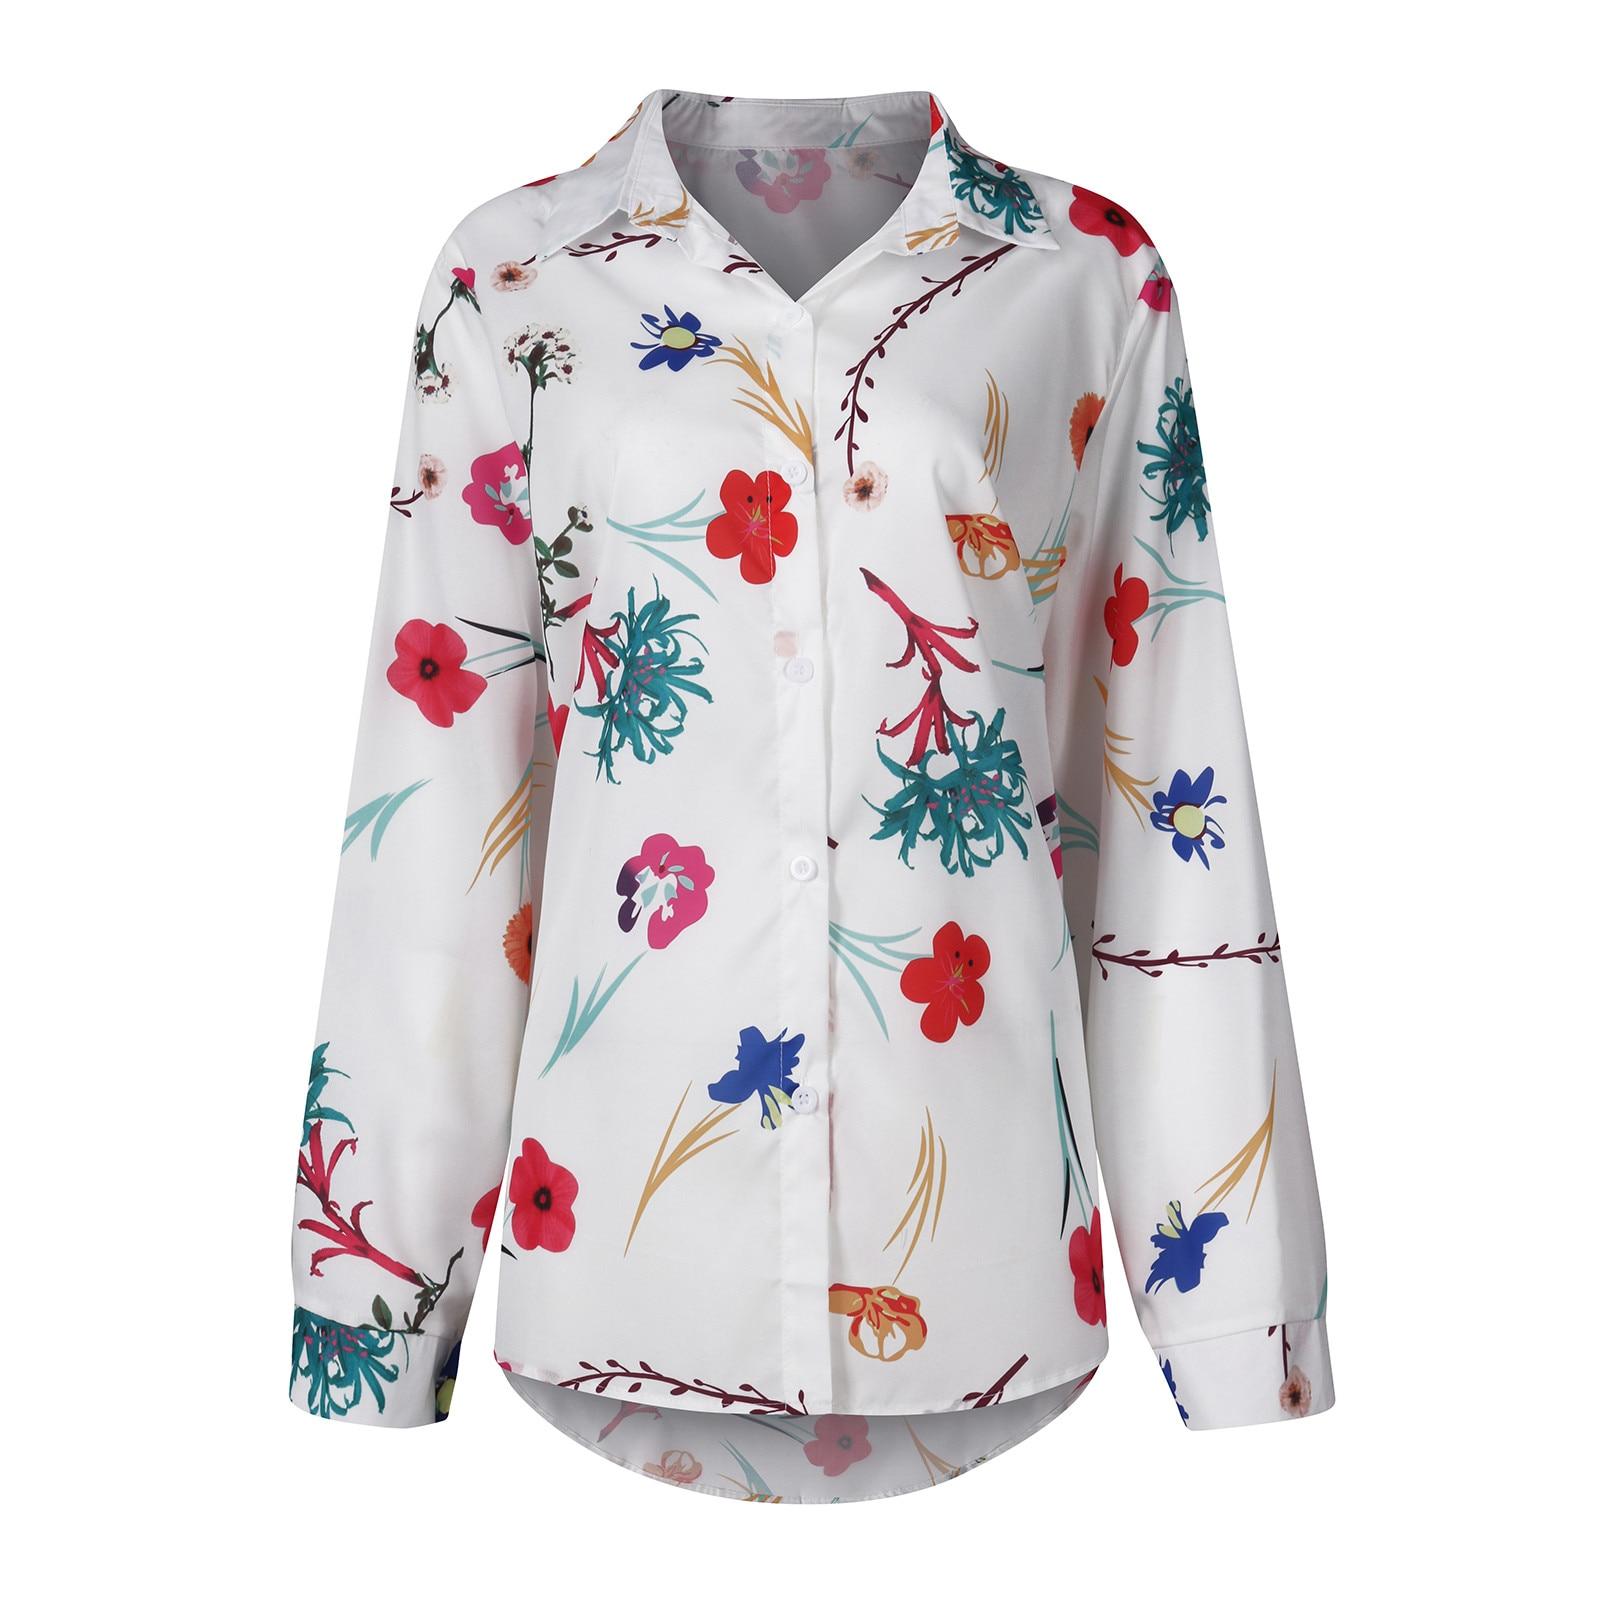 Women Casual Blouse Top Vintage Flower Printed Long Sleeve Ladies Button Shirts Femme Tops Blusa Bohemia Beach